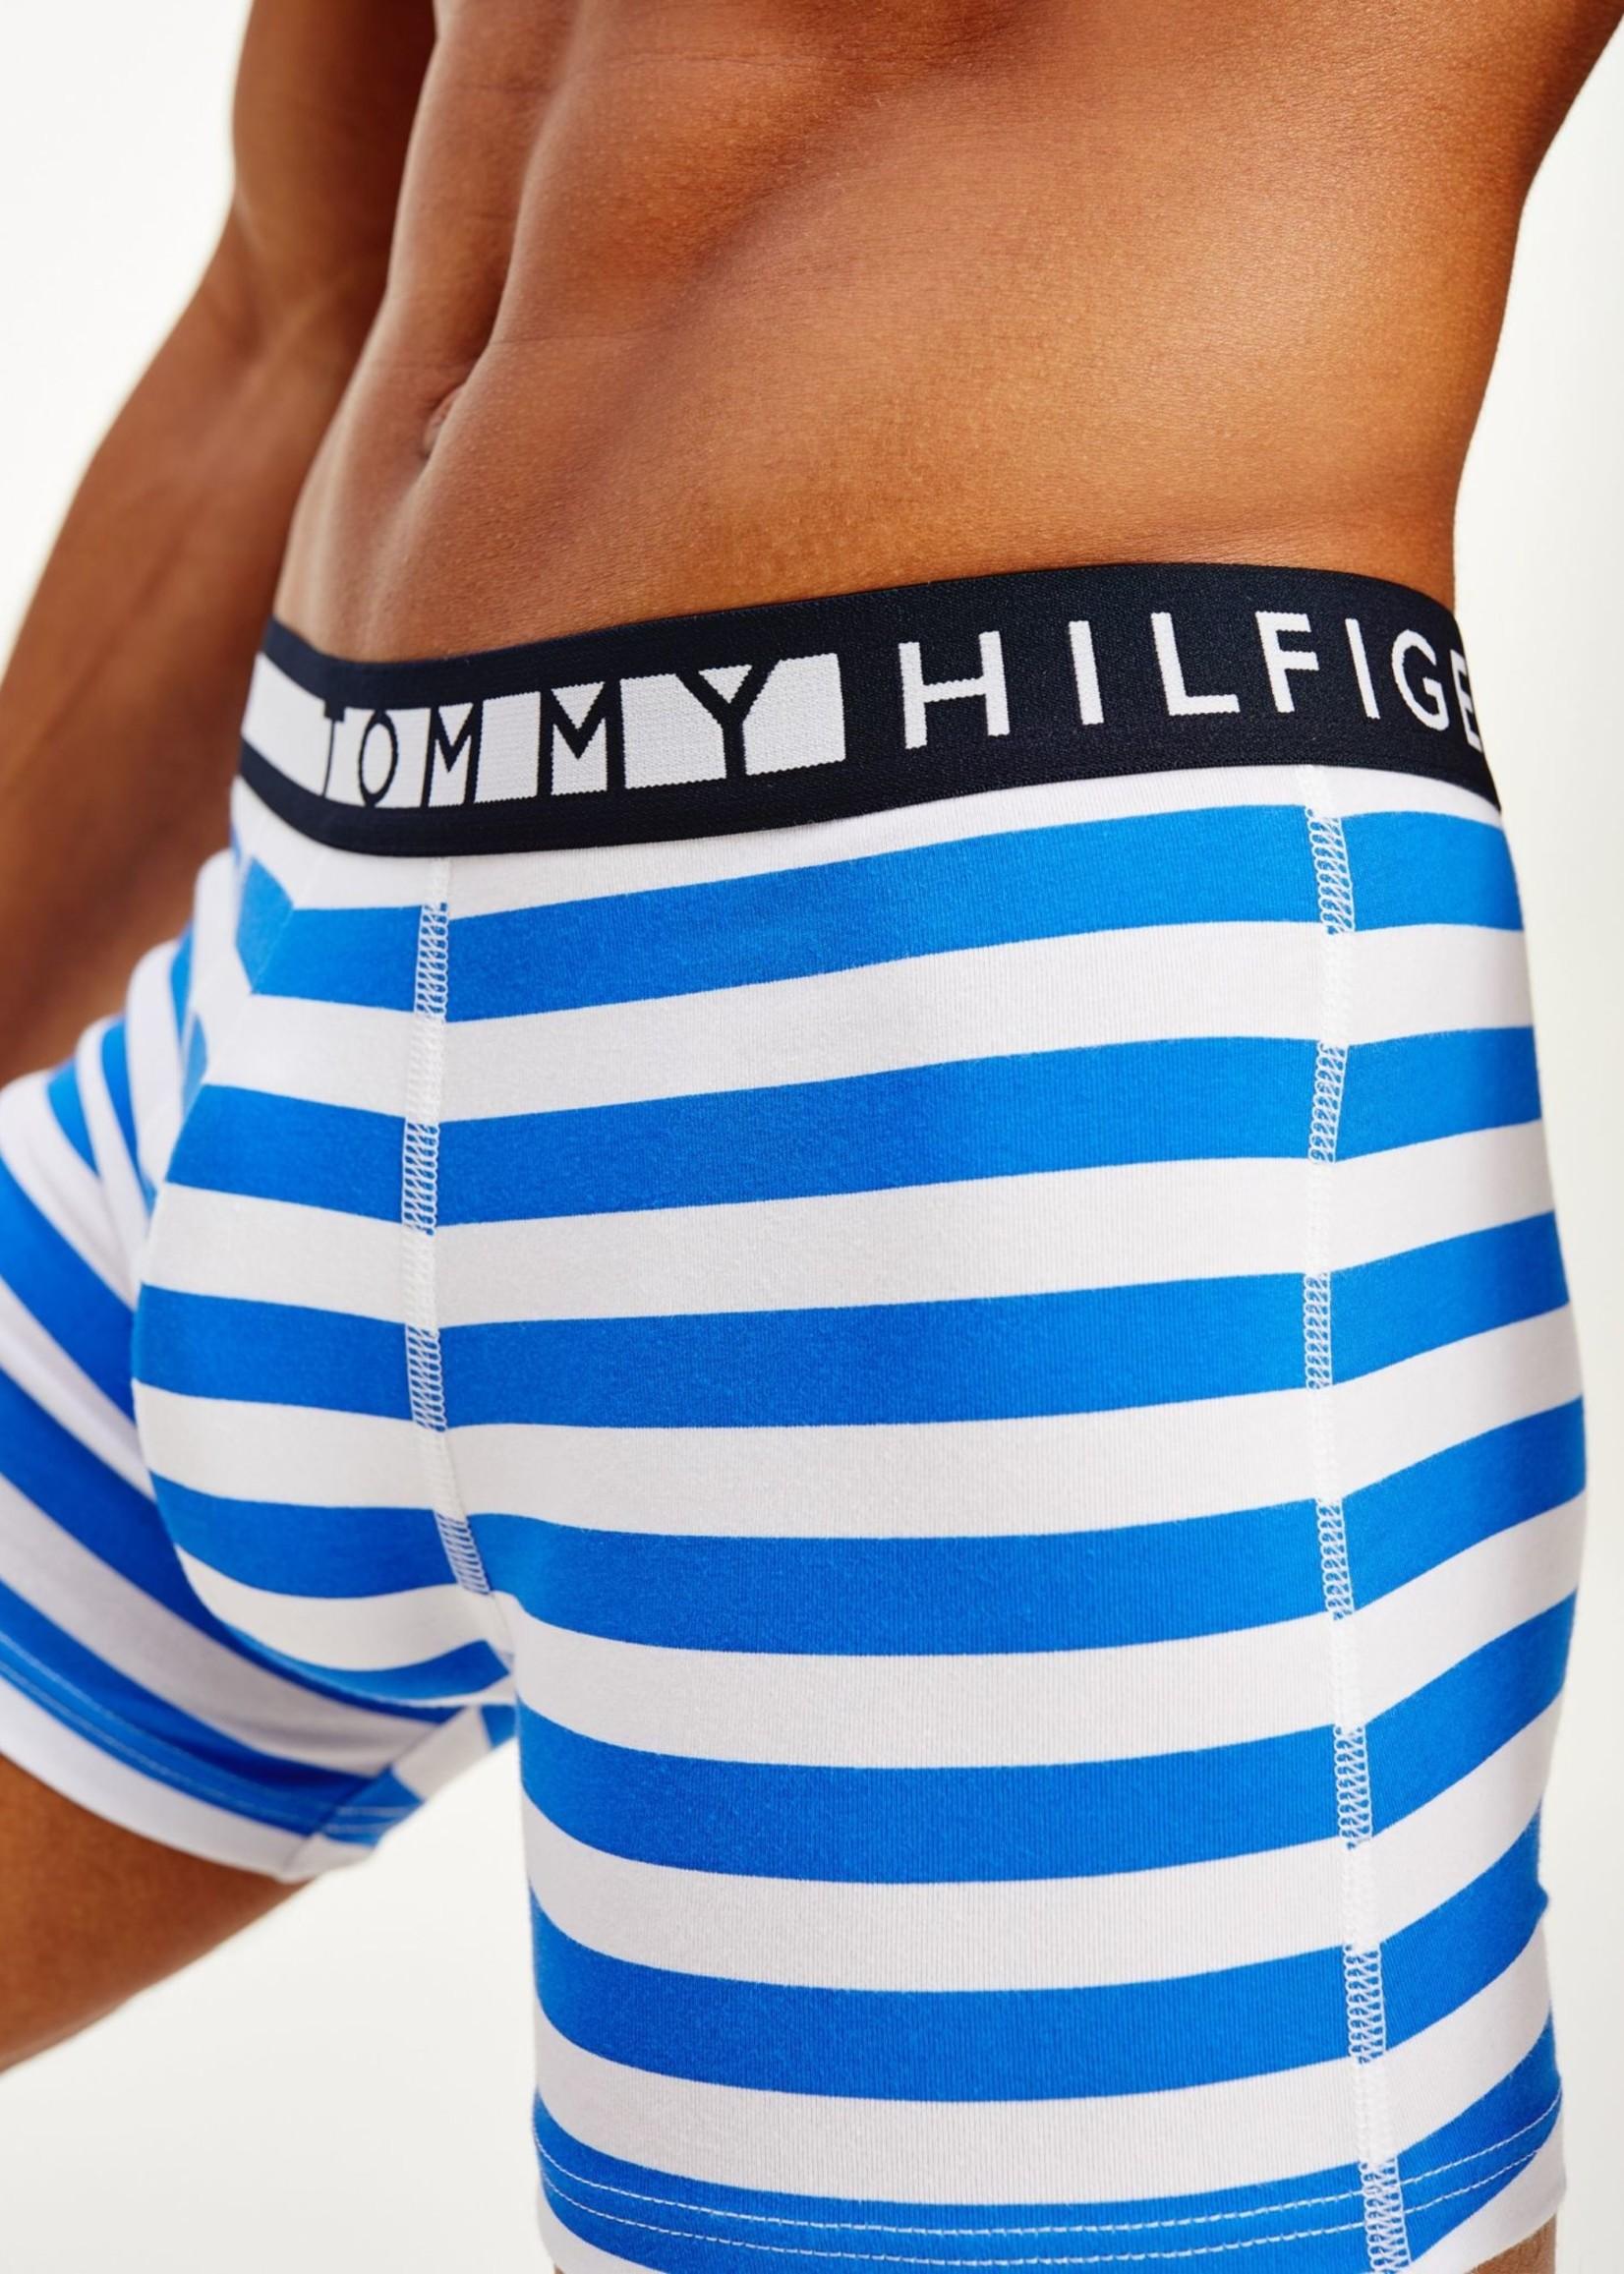 Tommy Hilfiger Set van 3 boxershorts van biologisch katoen | Donkerblauw/Geel/Blauwe streep | Tommy Hilfiger